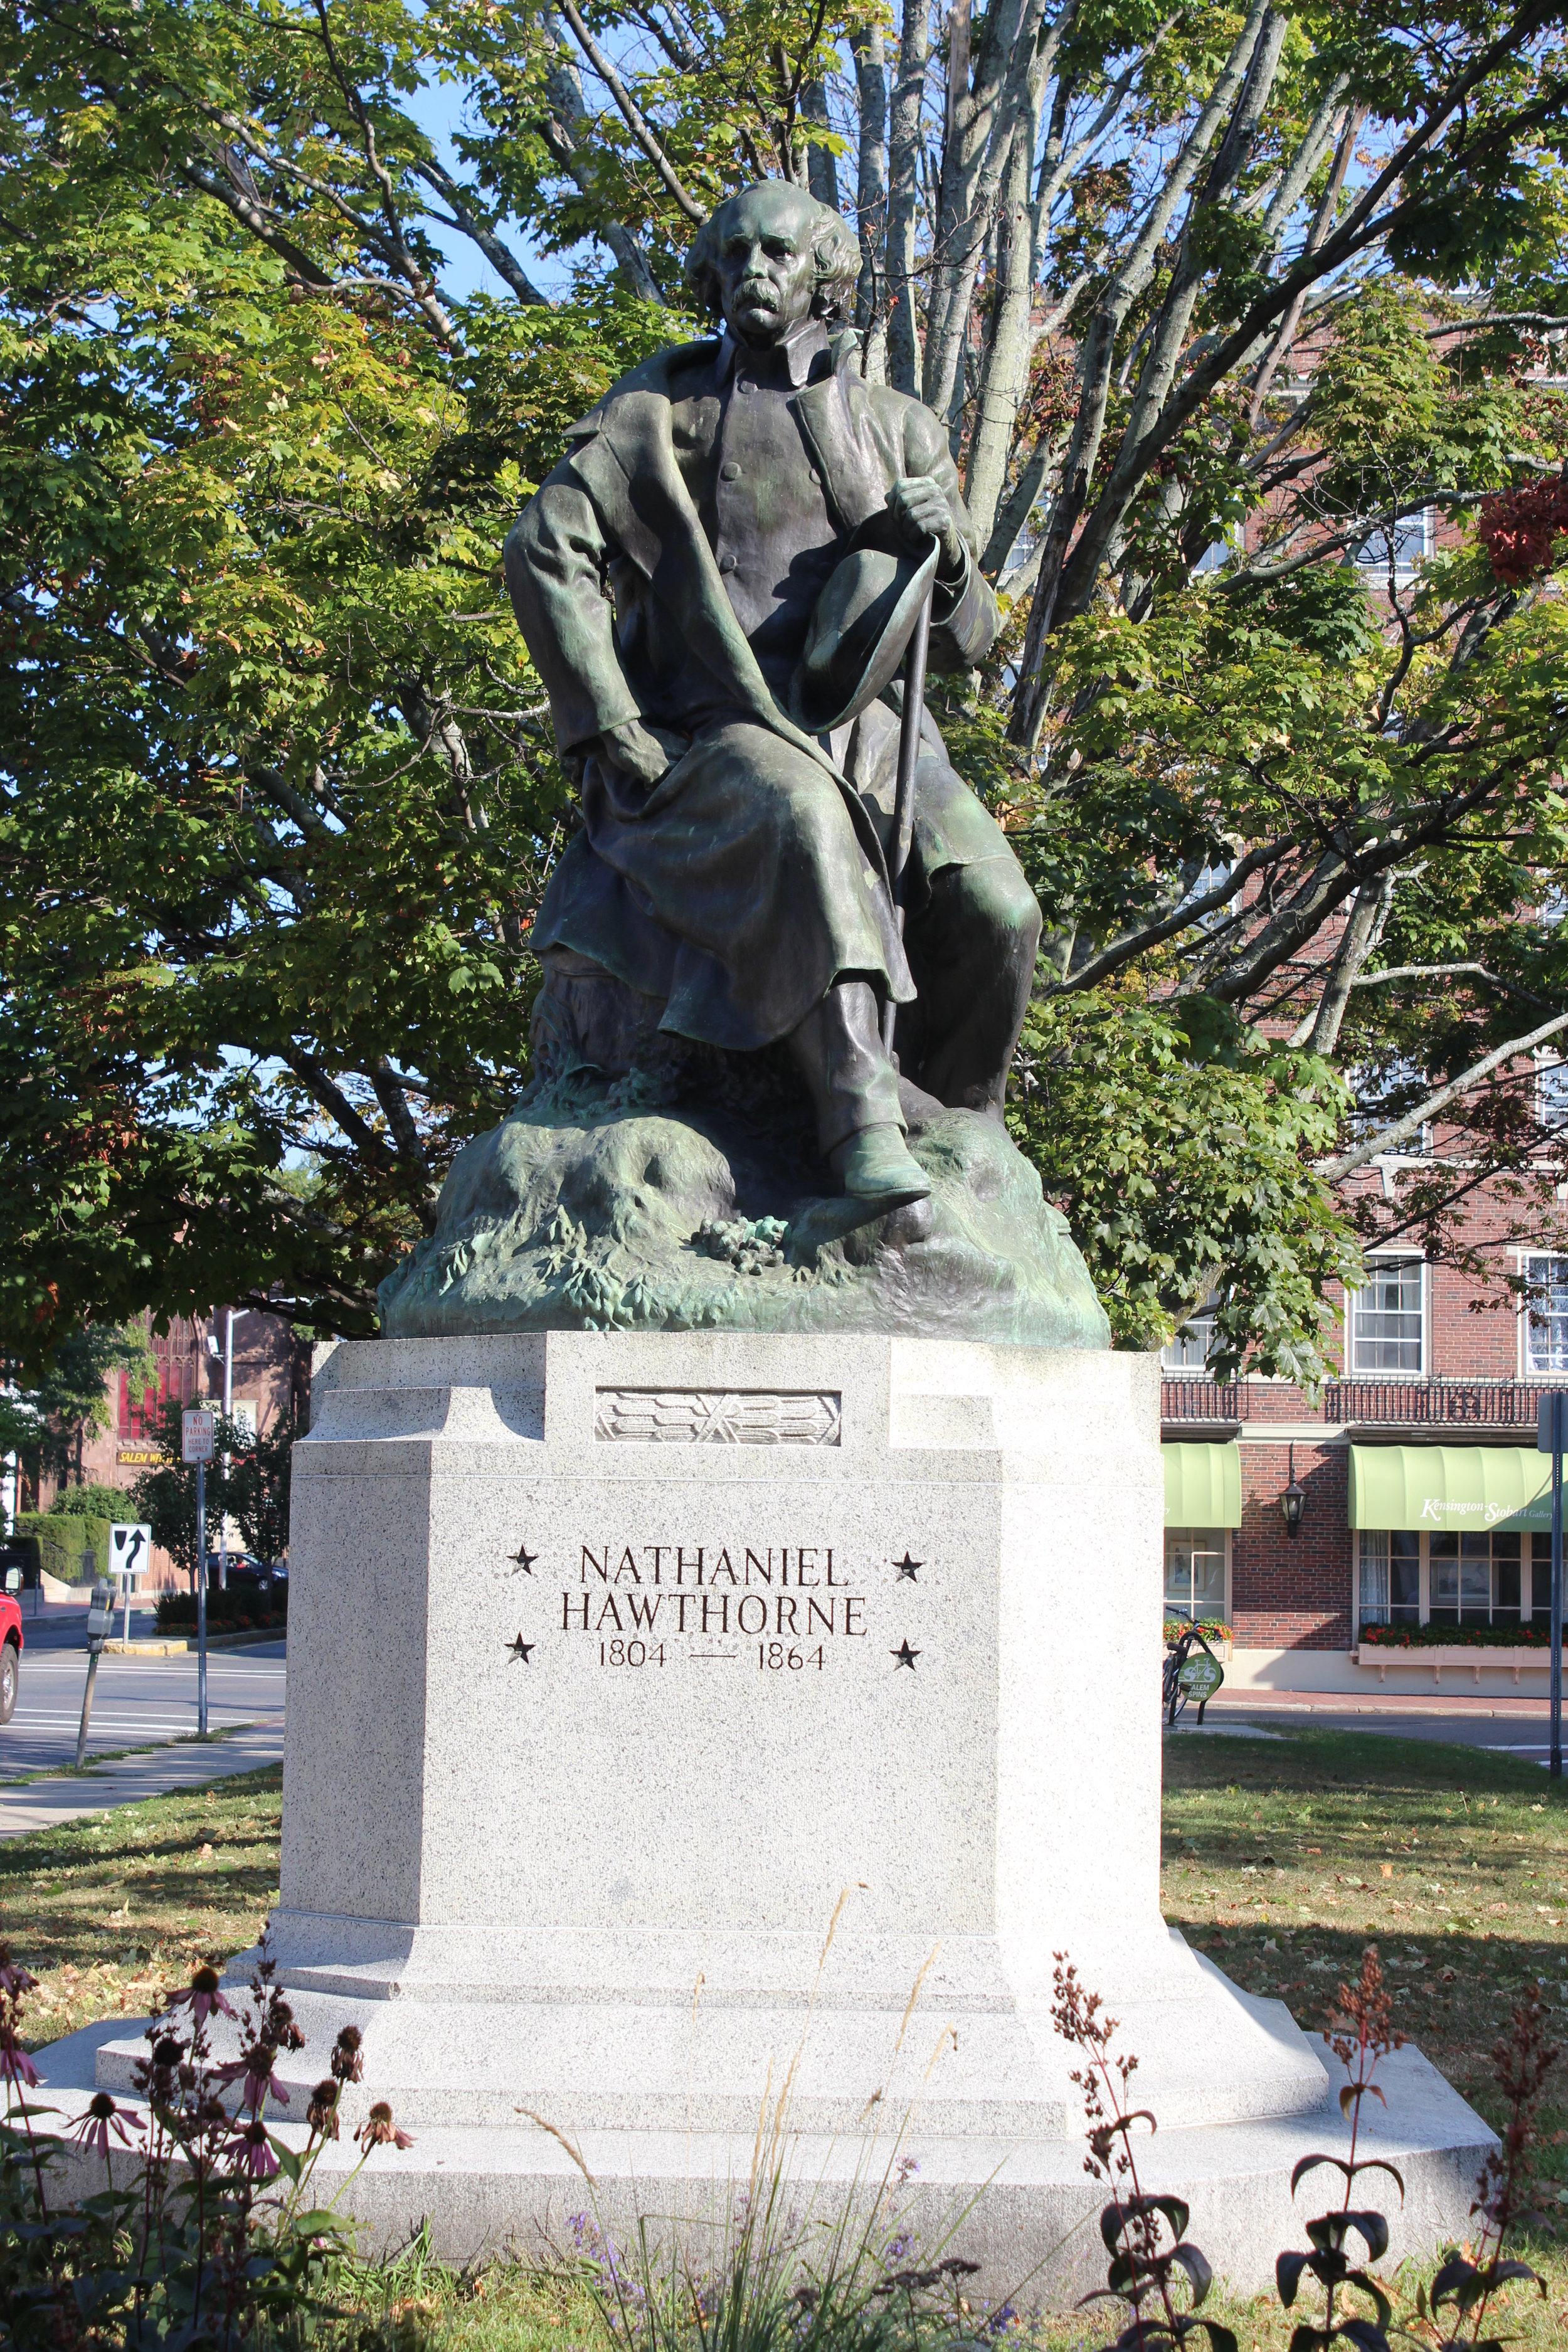 Nathaniel Hawthorne Statue